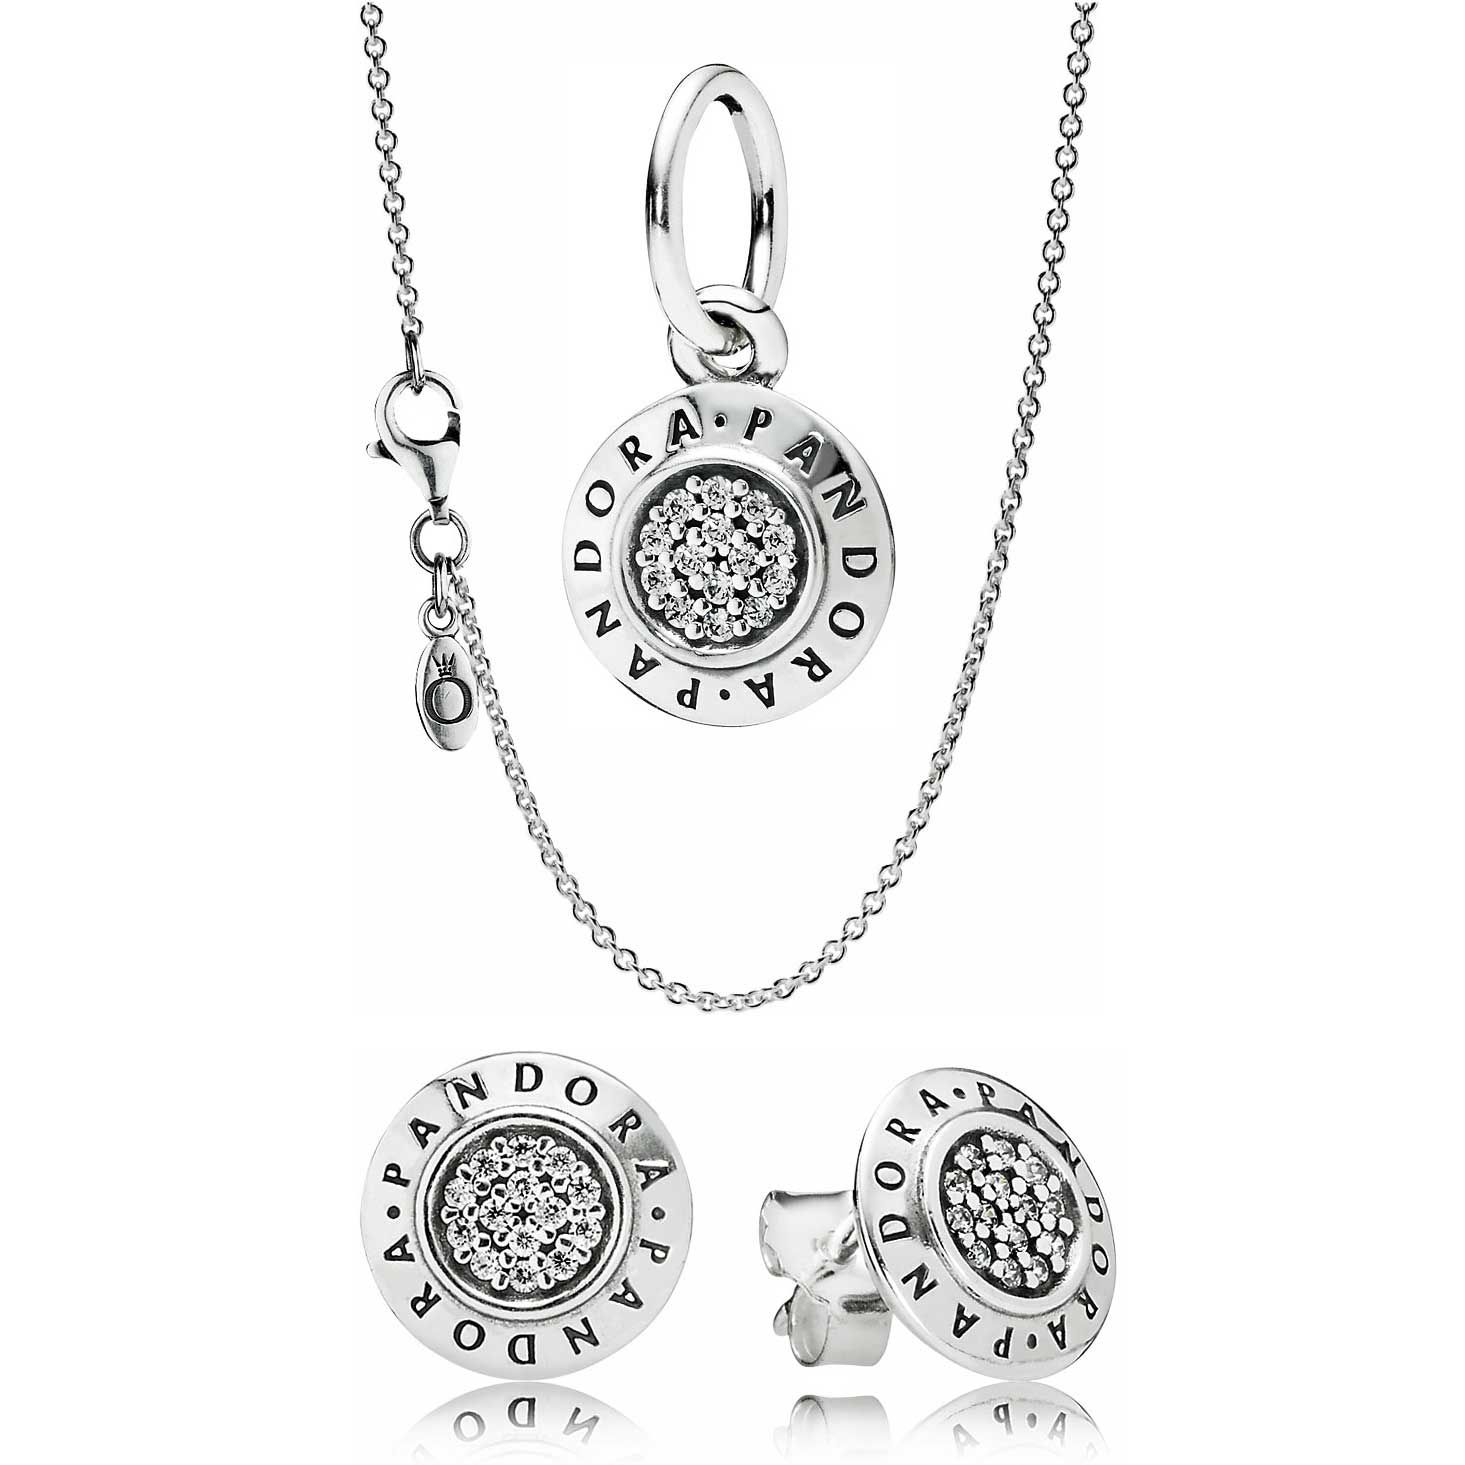 Pandora Signature Set Gift Set Earring Gift Set Pandora Earrings Pandora Necklace